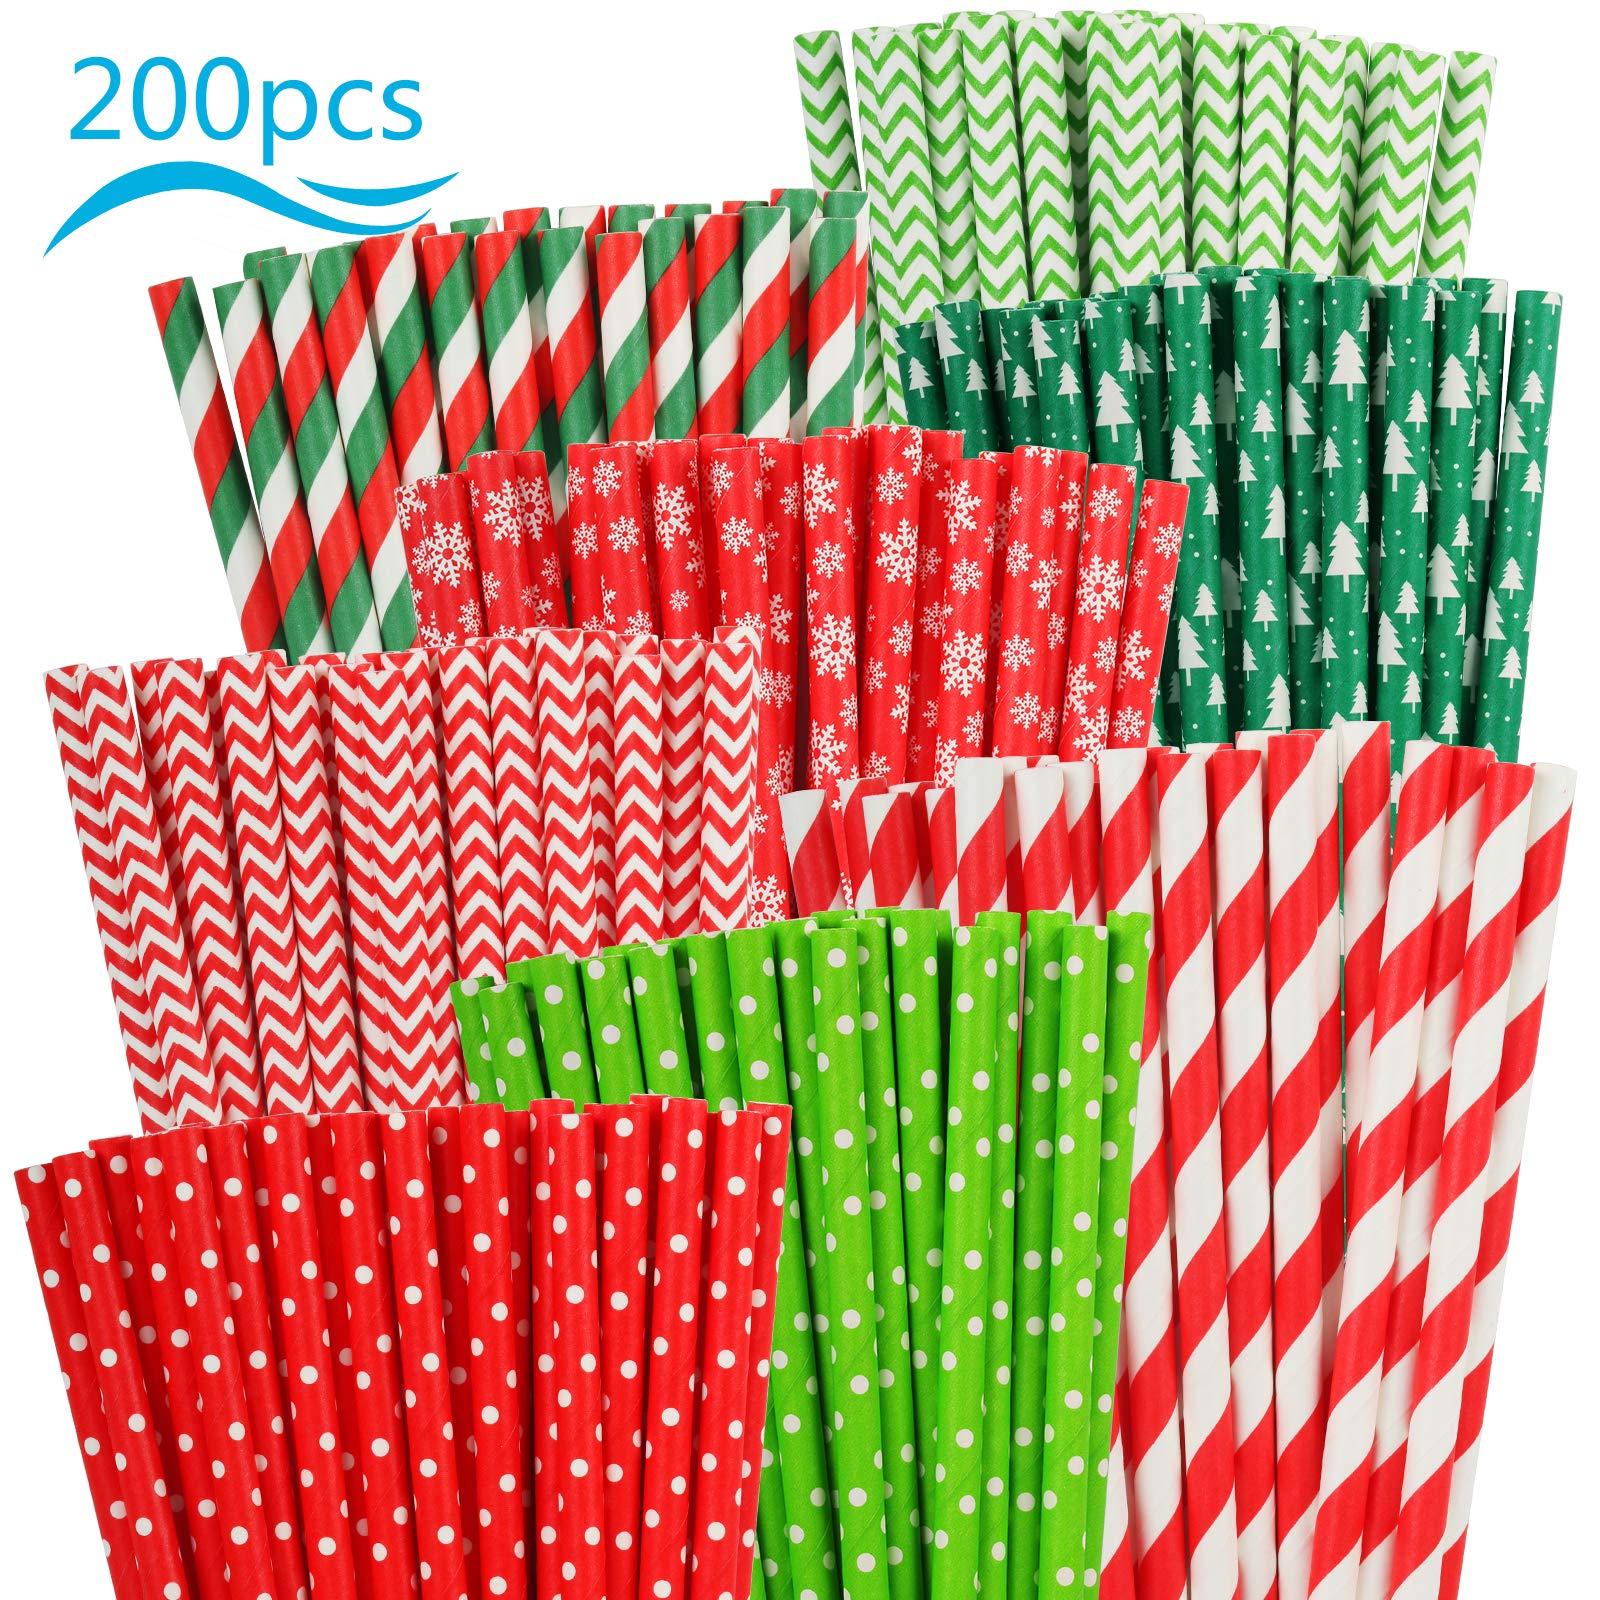 PATAZOK Paja Papel Biodegradable Colorido 200PCS Pajitas de Papel ...